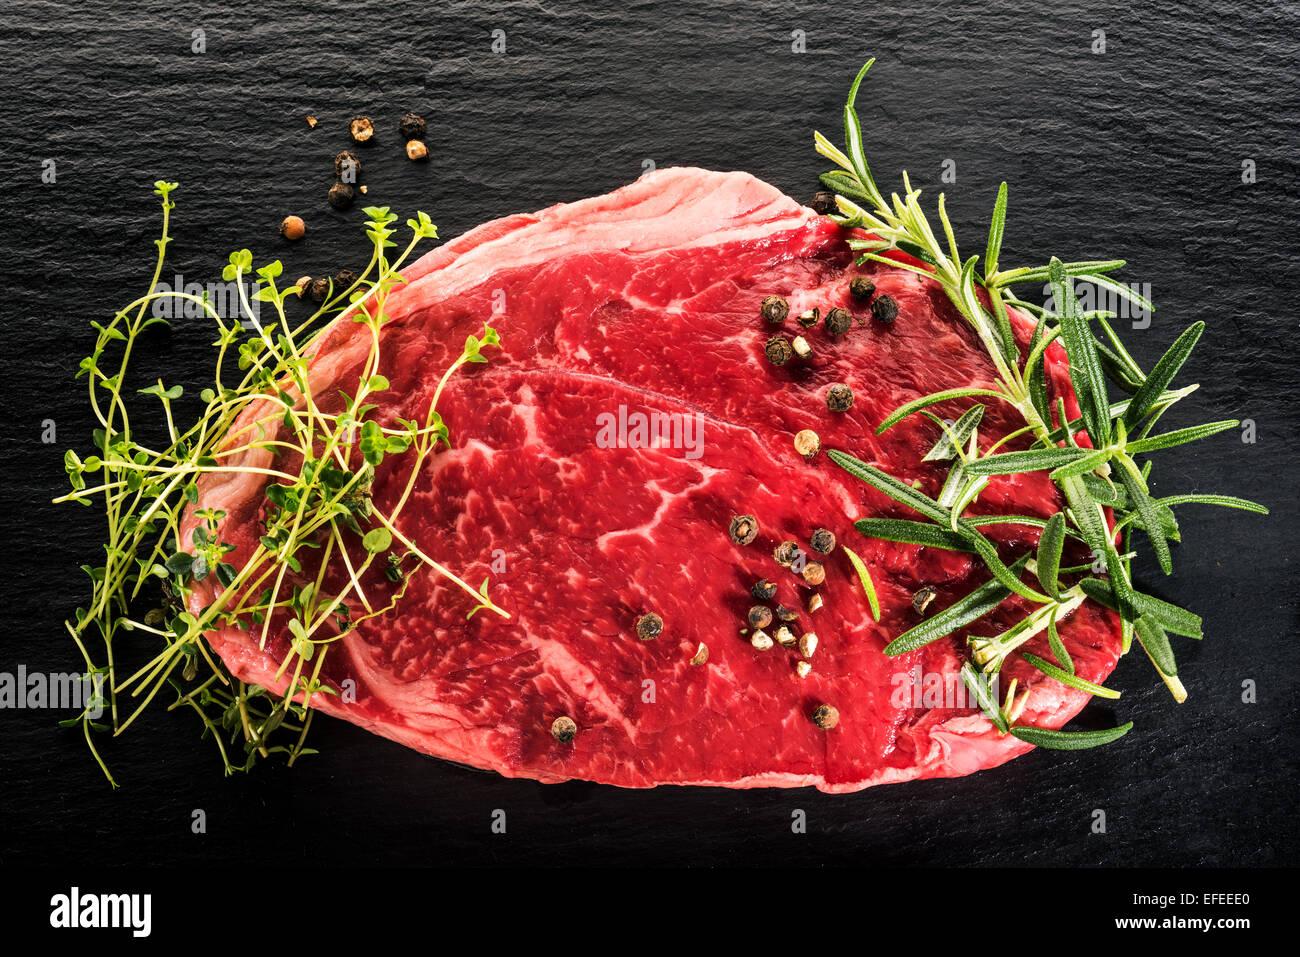 Carne cruda pura carne de res estadounidense bistec bistec arco comer animales alimentos carne rebanada de asar Imagen De Stock